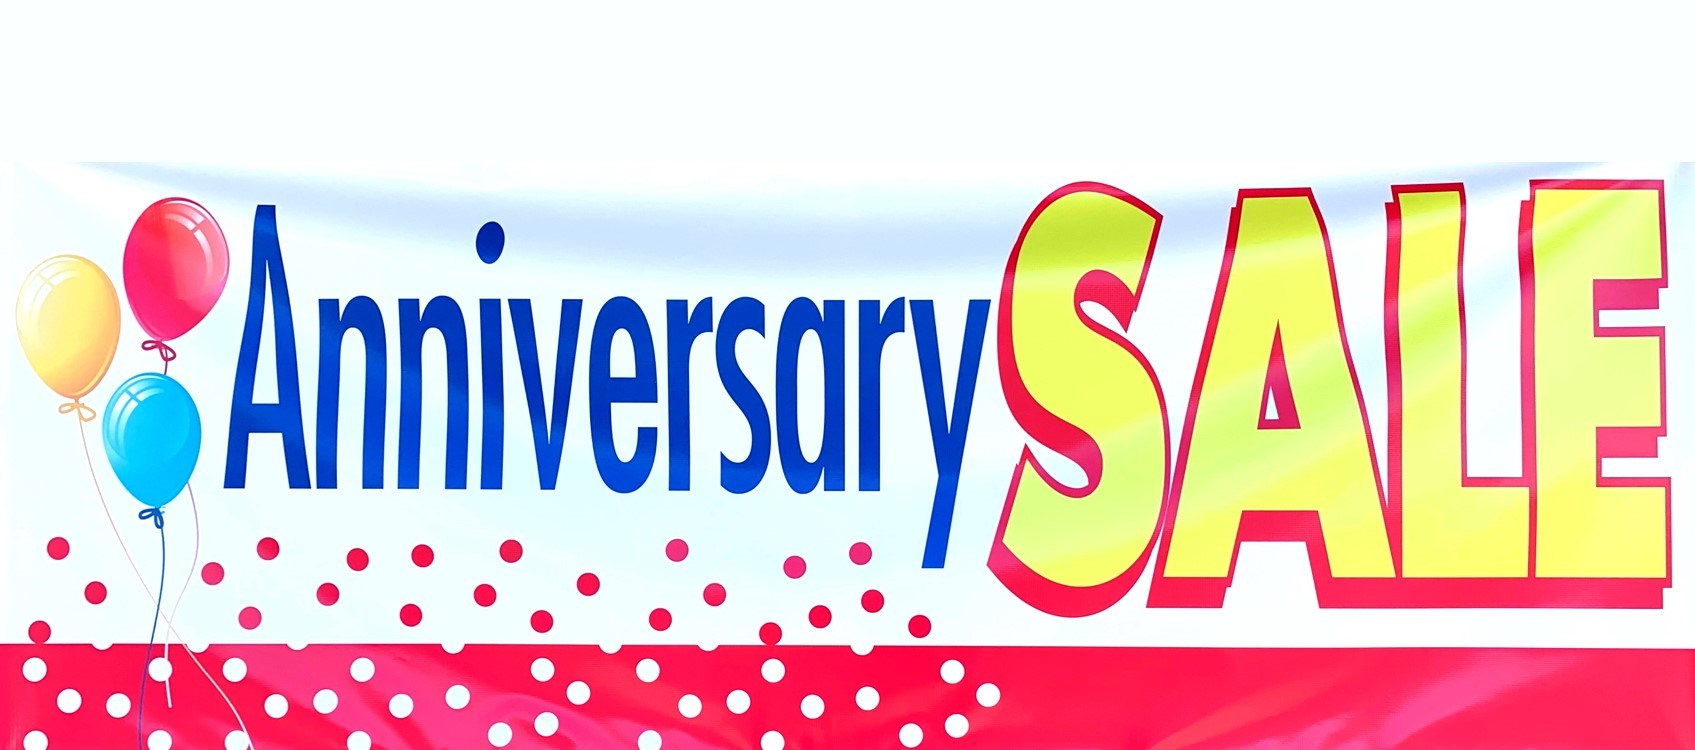 35th Anniversary Sale